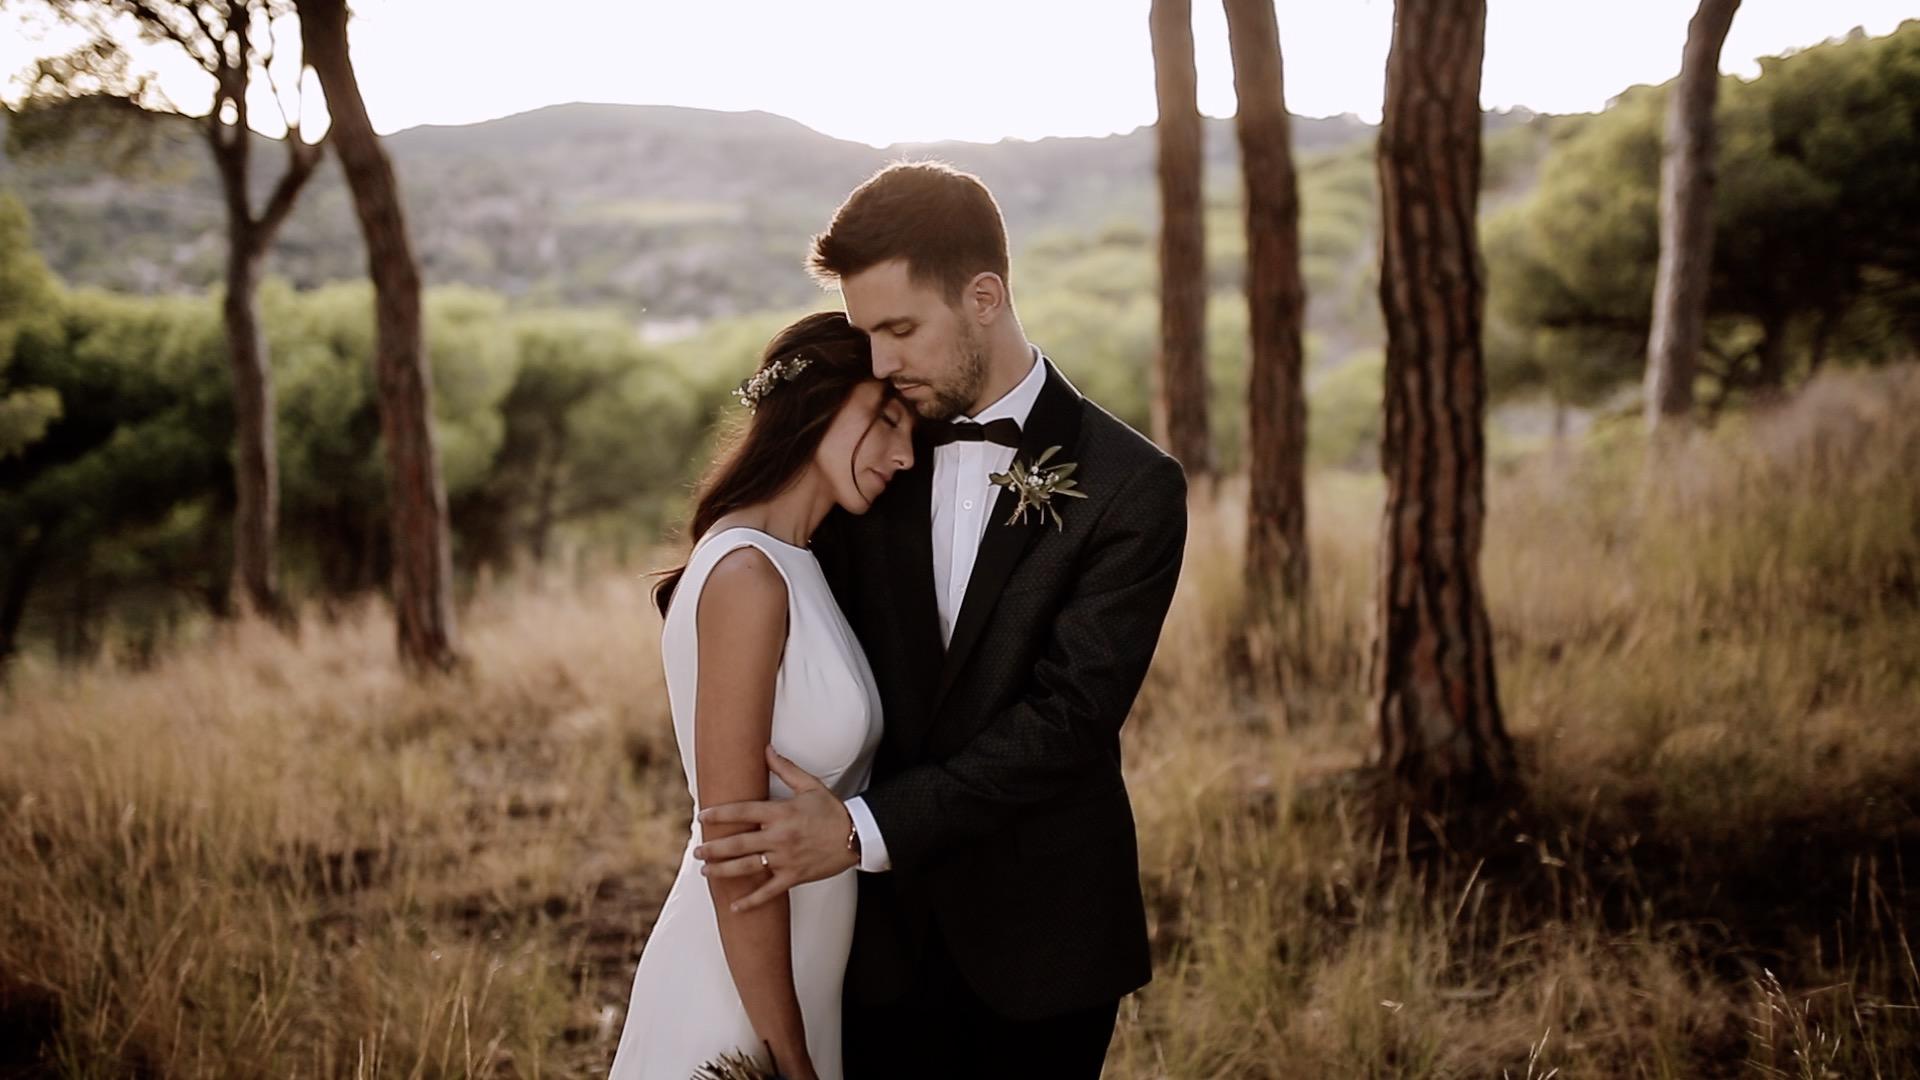 fénix visual, adriá y maría, boda en costa brava, videografo boda barcelona, barcelona weddings, pareja abrazandose,